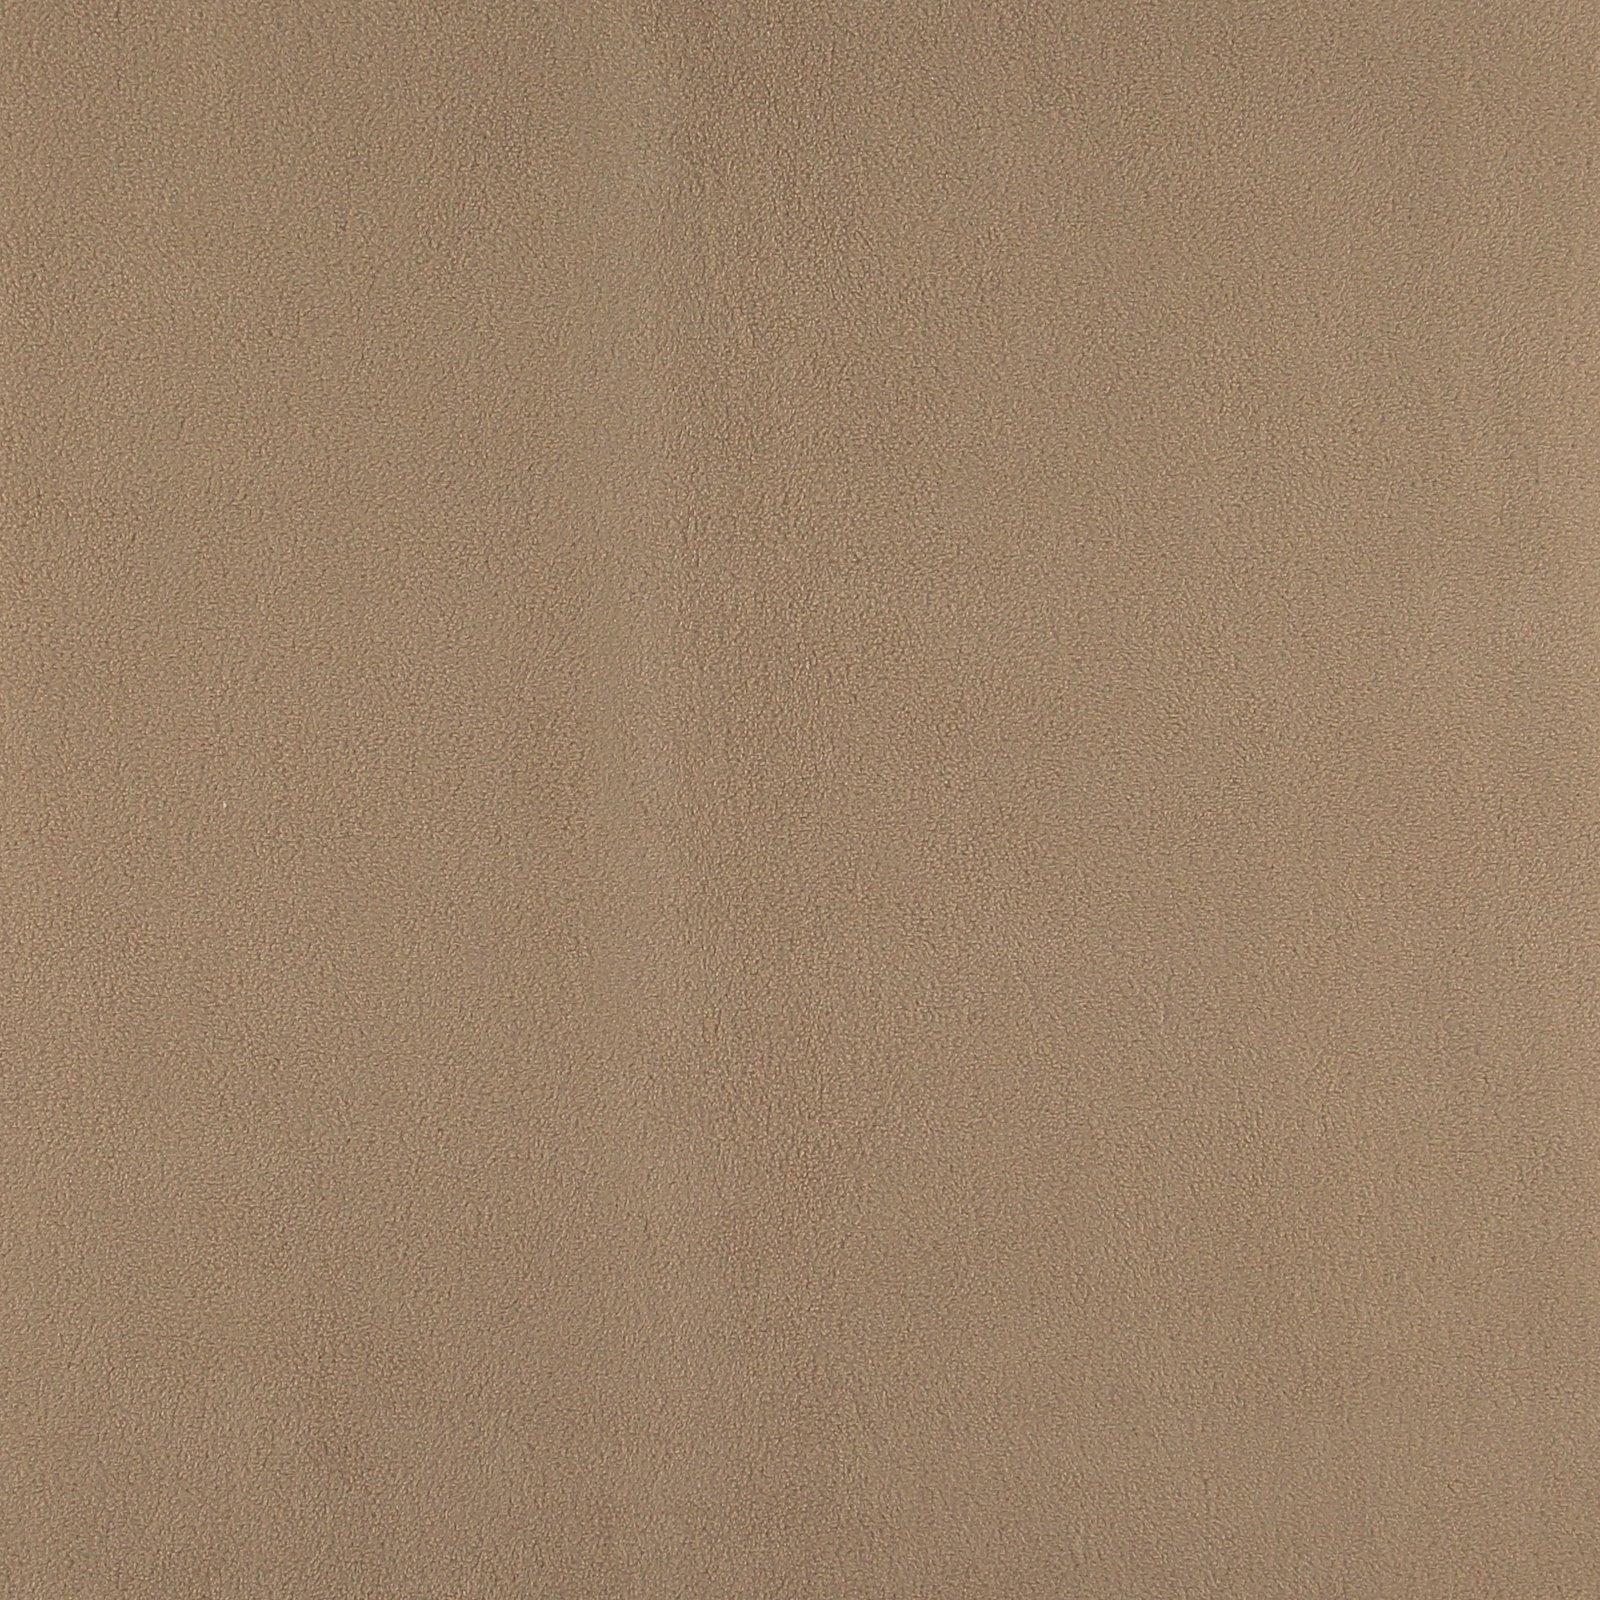 Polar fleece dark beige 220650_pack_sp